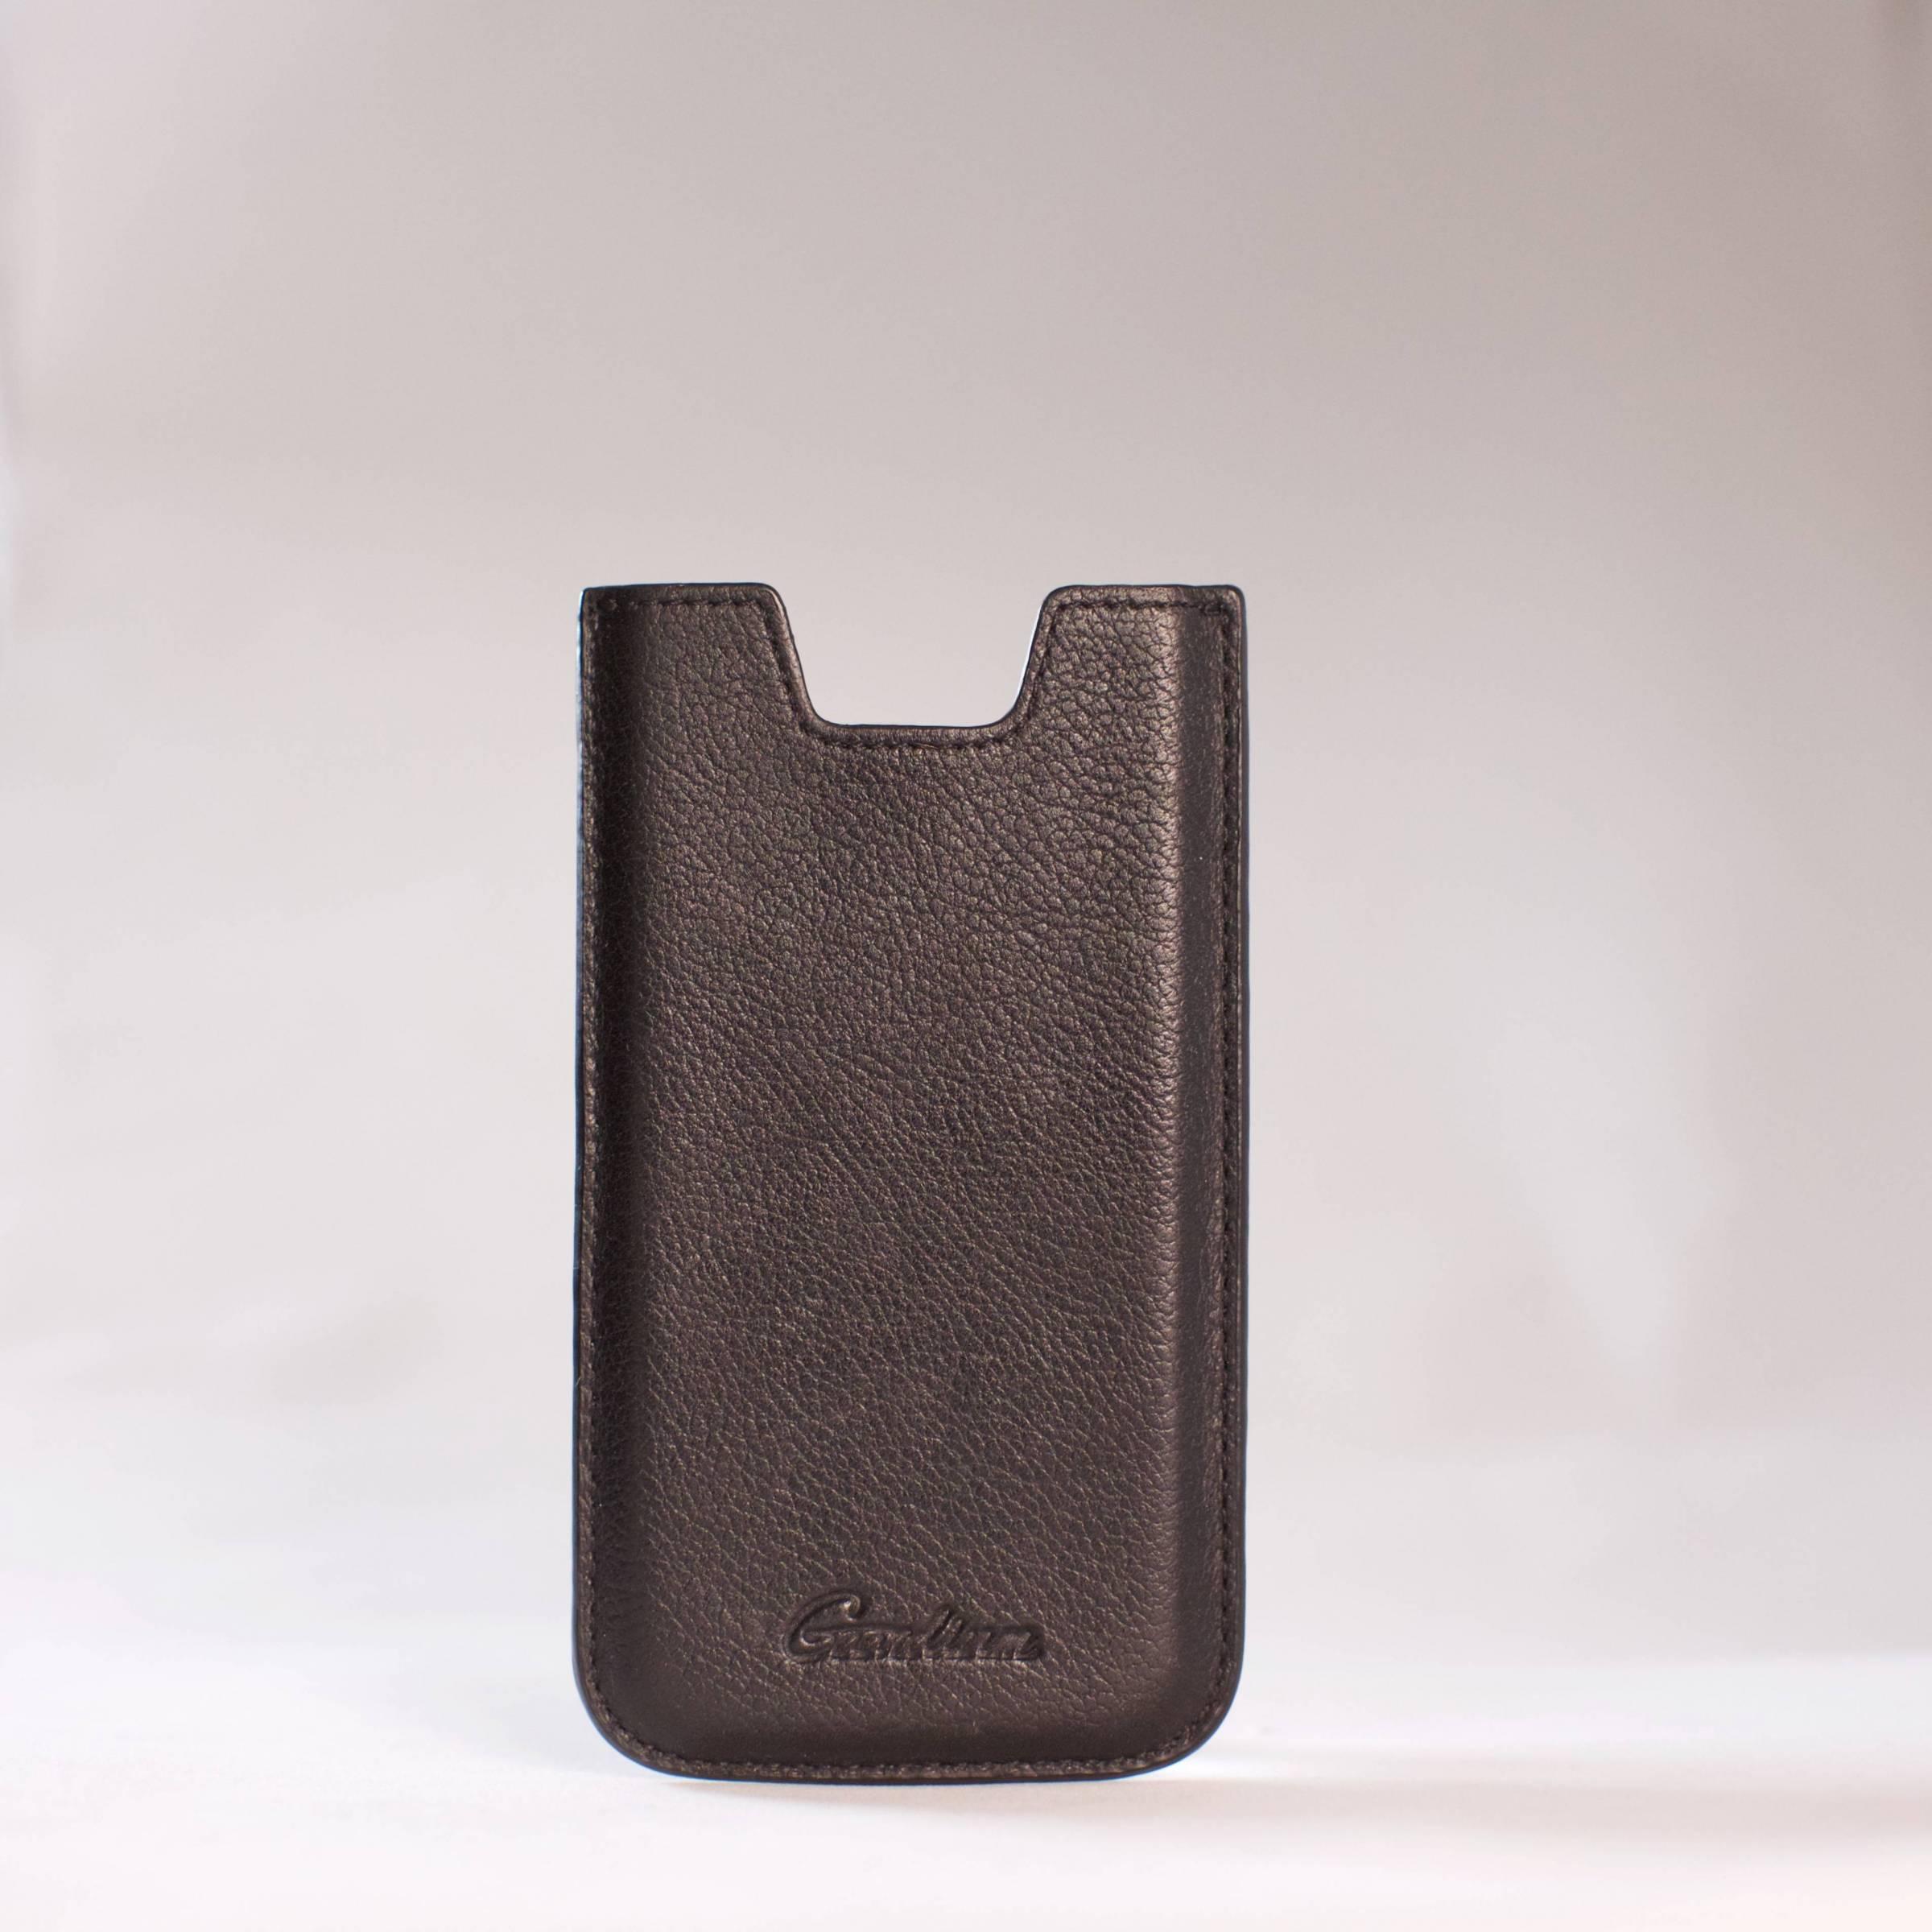 gaardium – Gaardium sleeve iphone 5/5s/5c/se farve sort på mackabler.dk